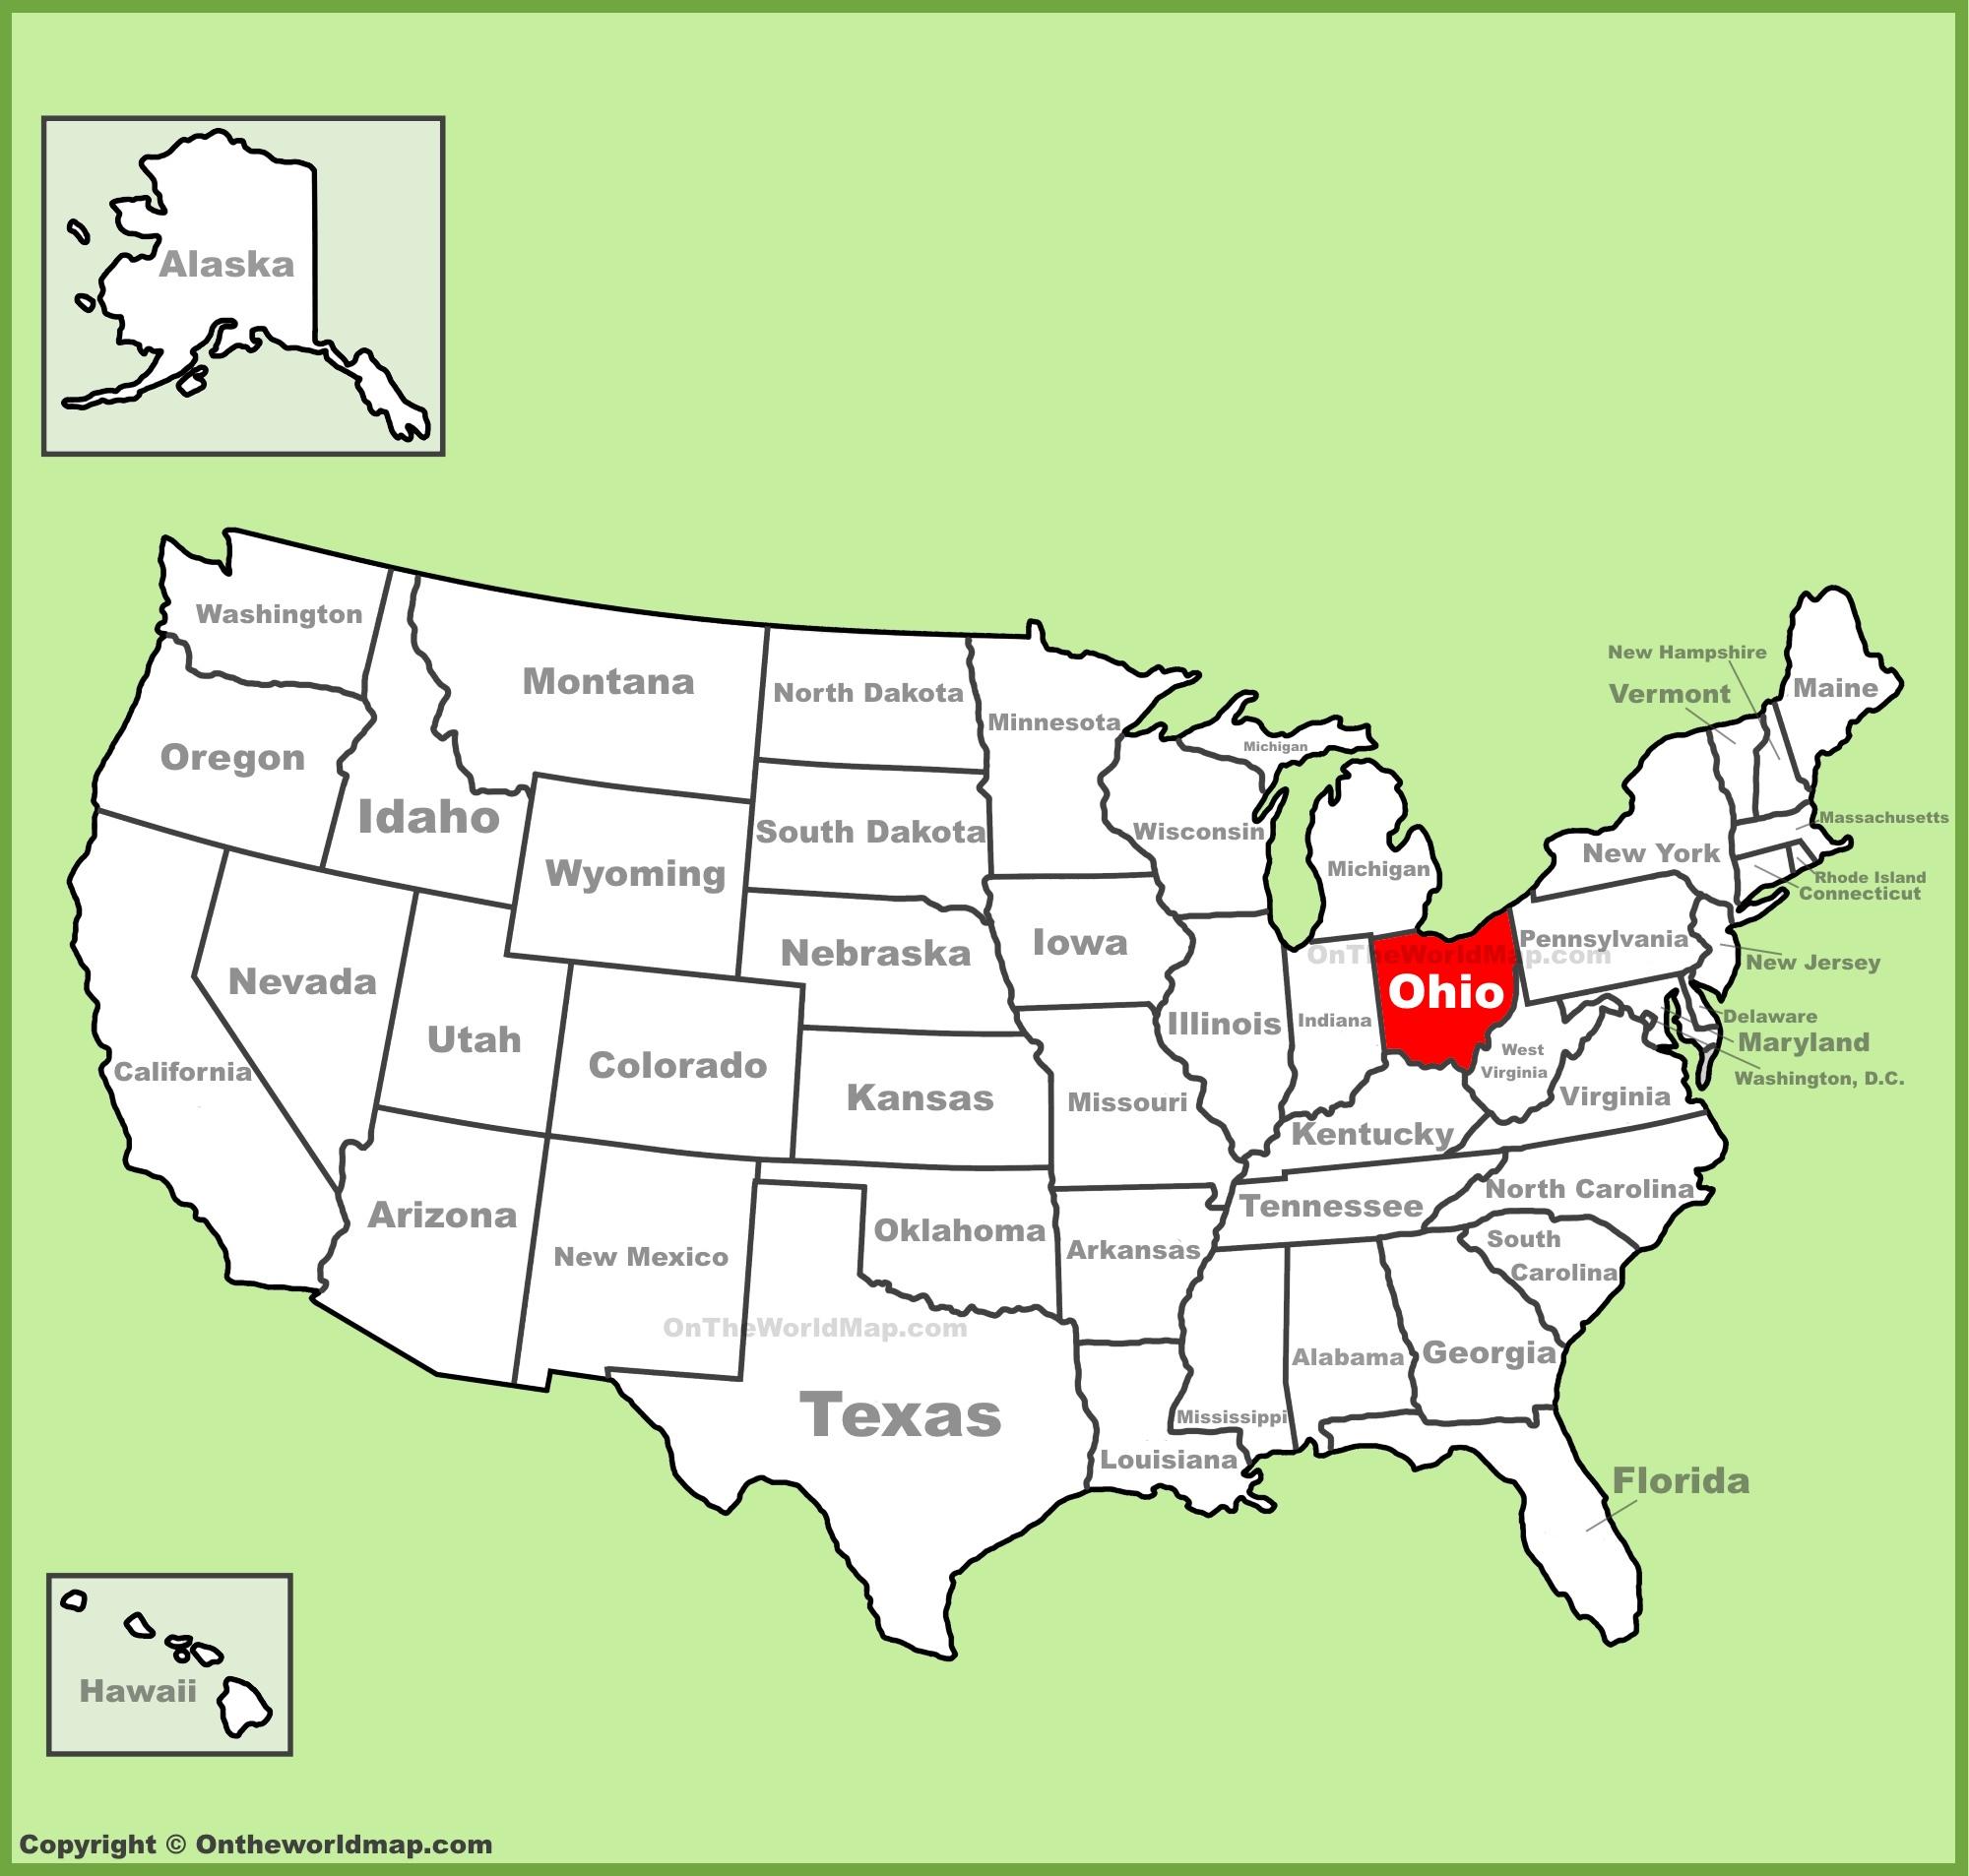 Ohio location on the U.S. Map